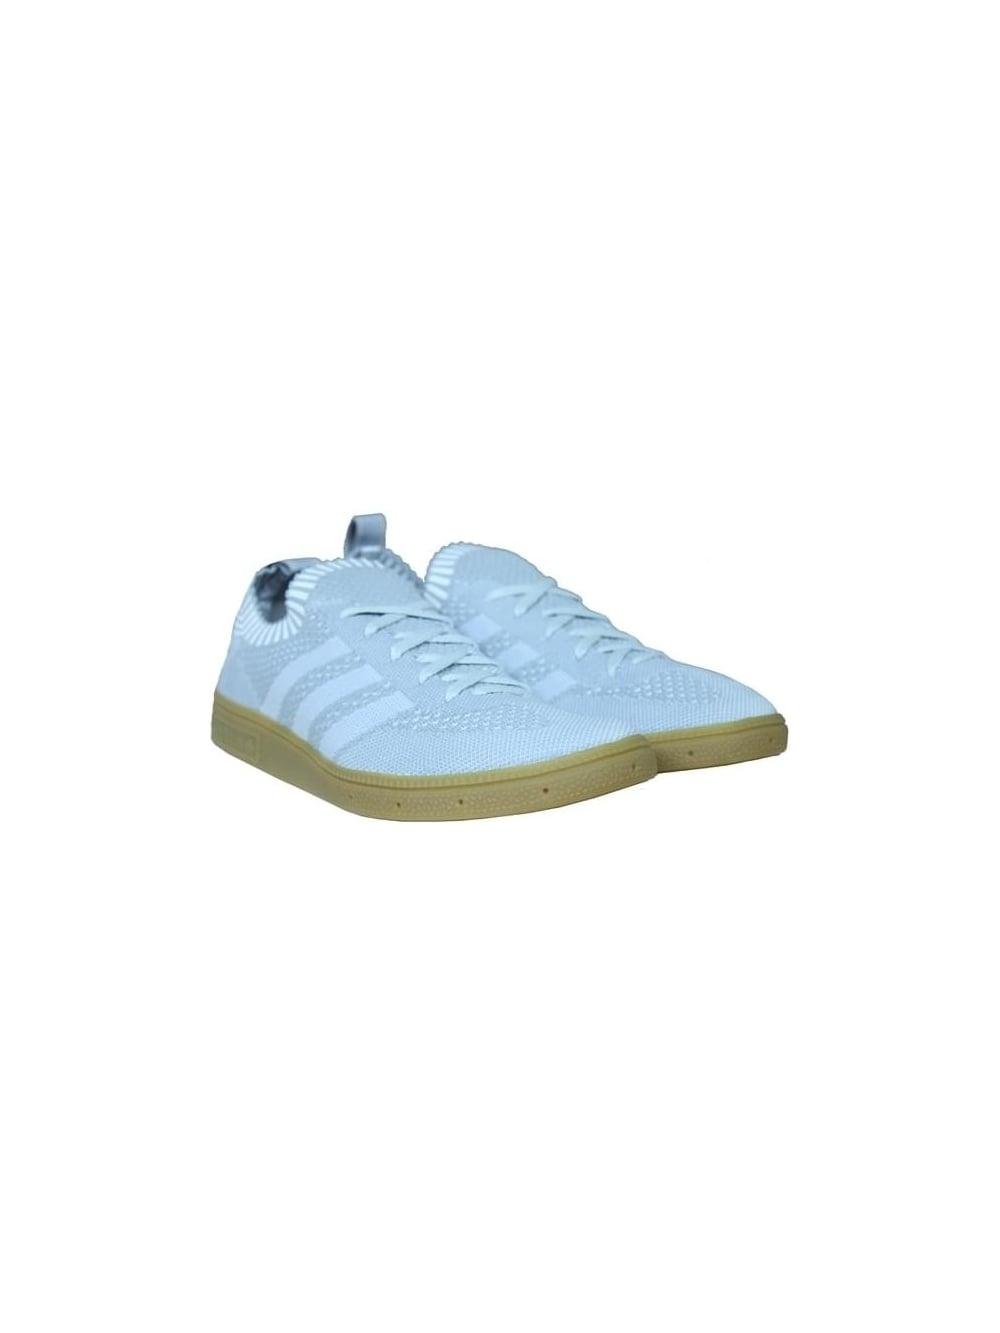 buy online b43e3 c70de Very Spezial Primeknit Trainer - Onix Grey